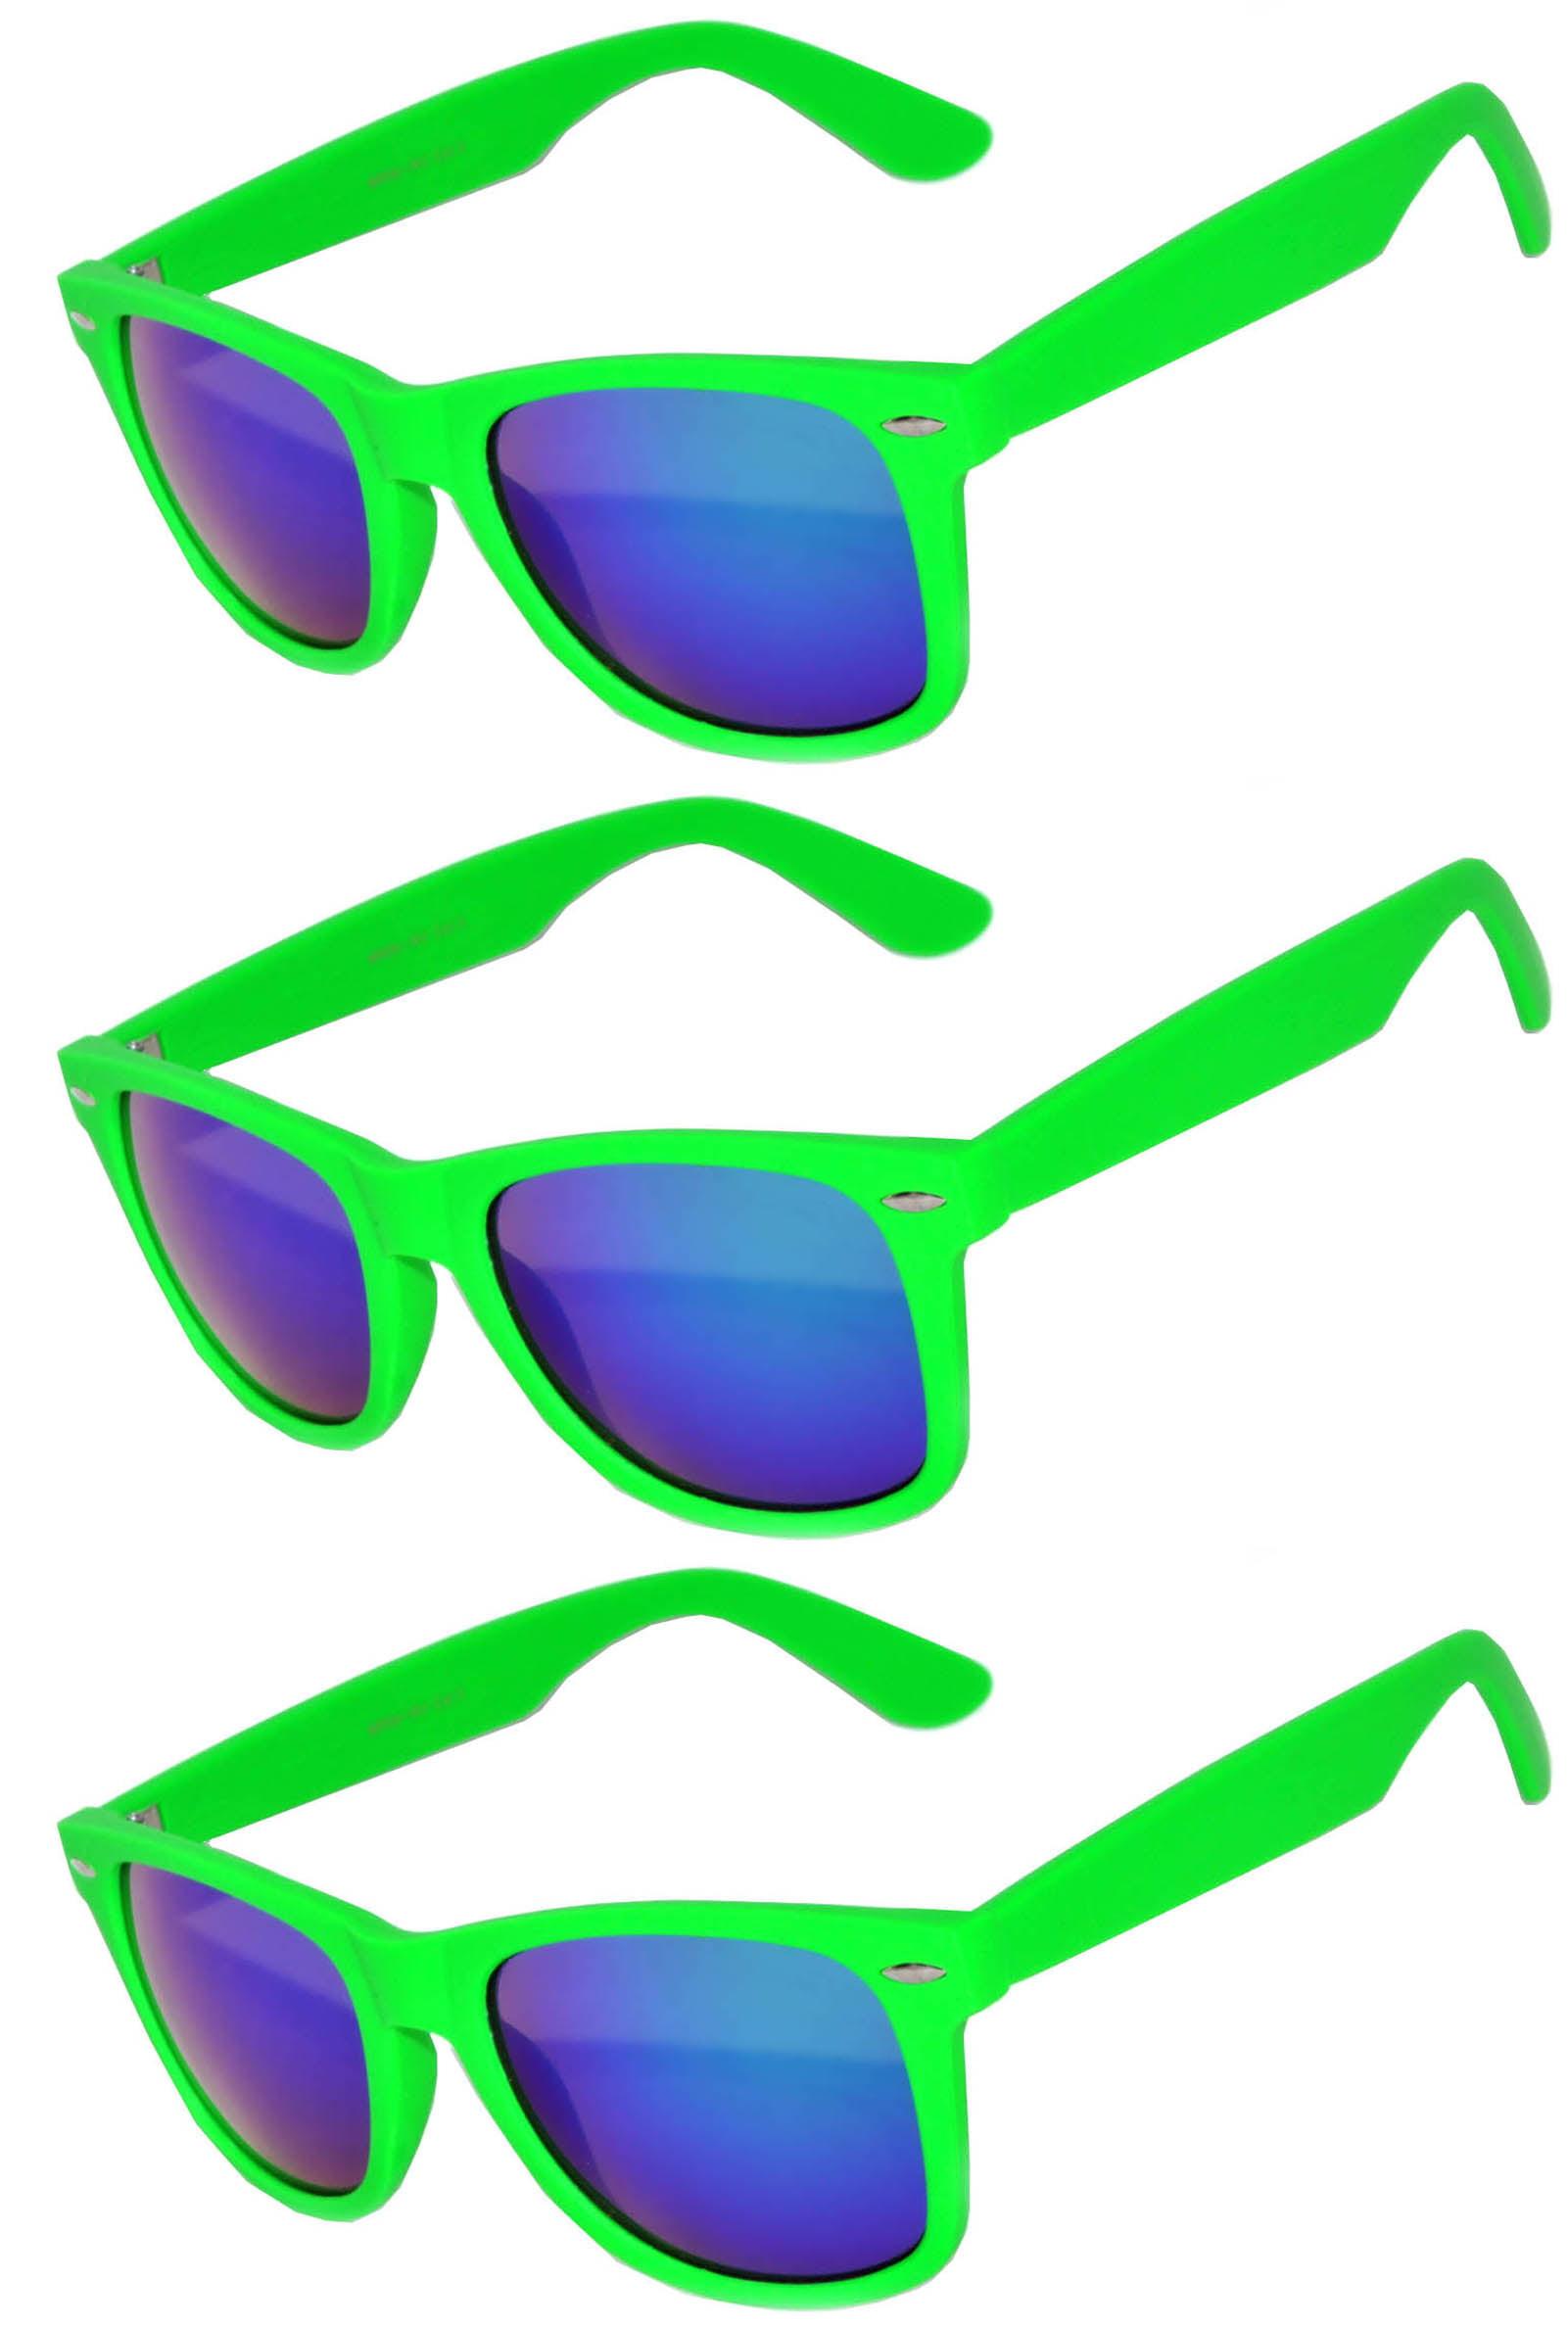 Retro Matte 80's Vintage Party Sunglasses Green Frame Blue Lens OWL (3 Pack)